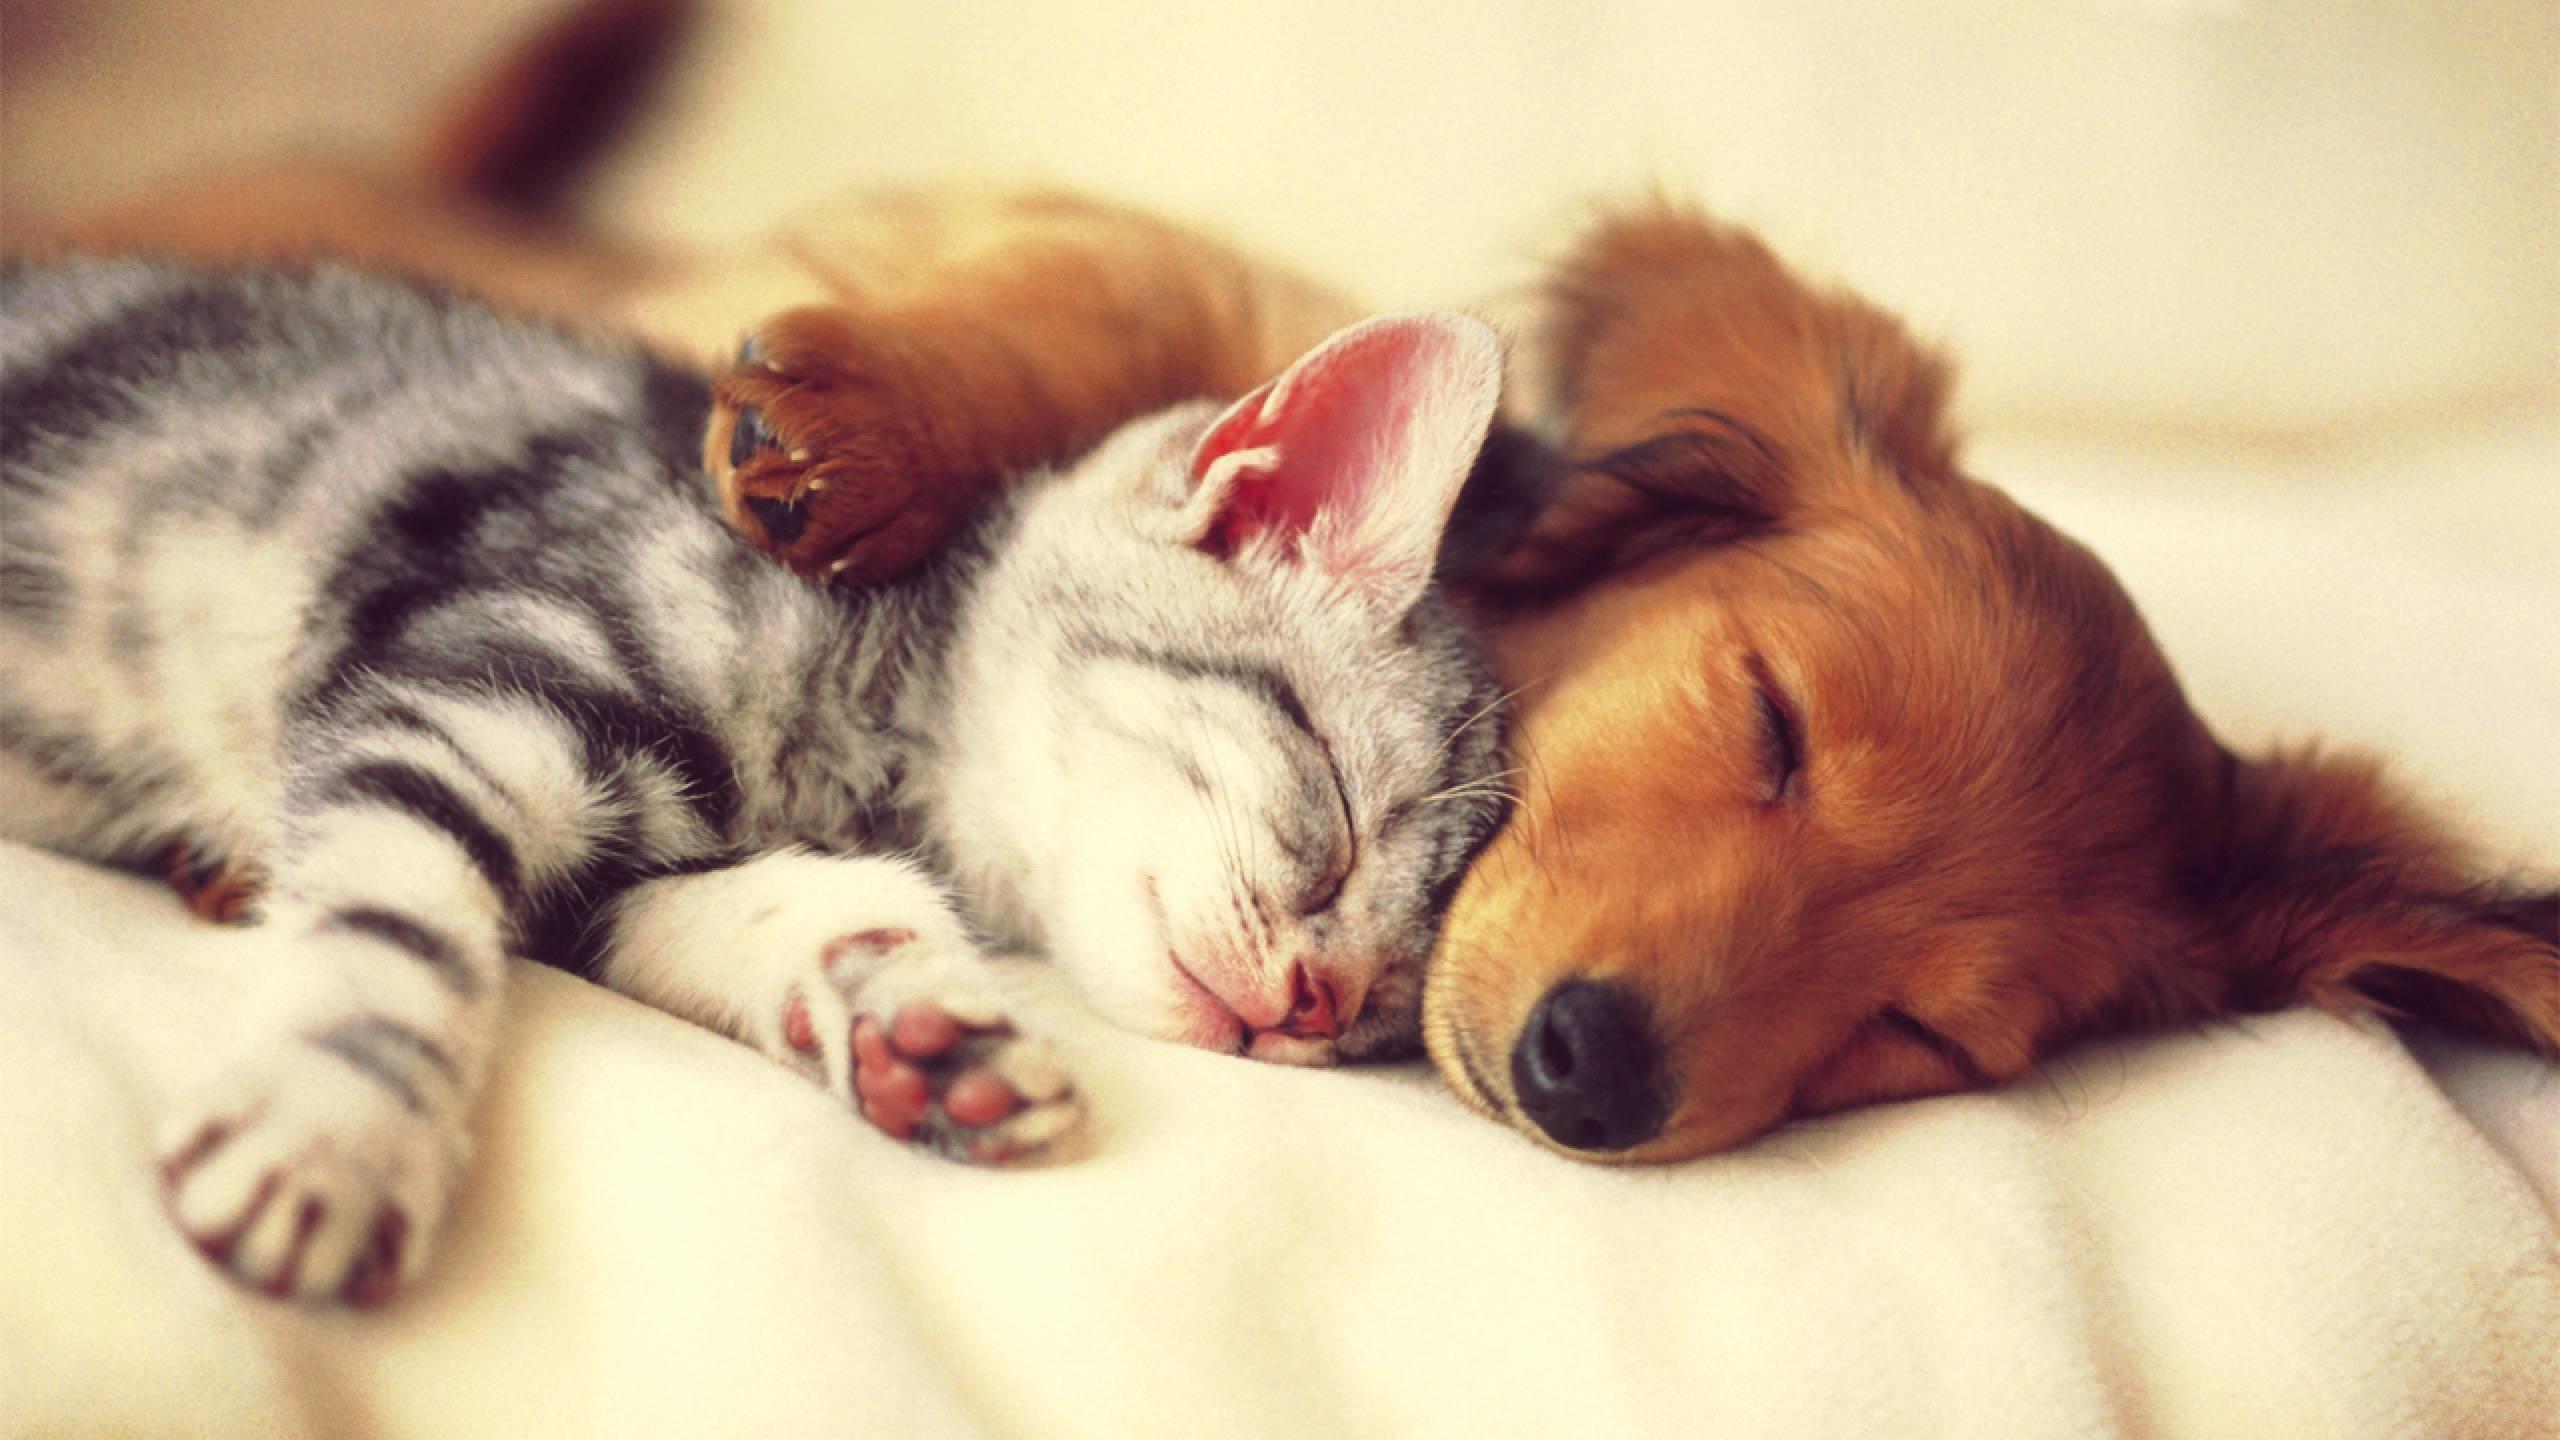 2560x1440 Cute Cat And Dog Sleep Wallpaper